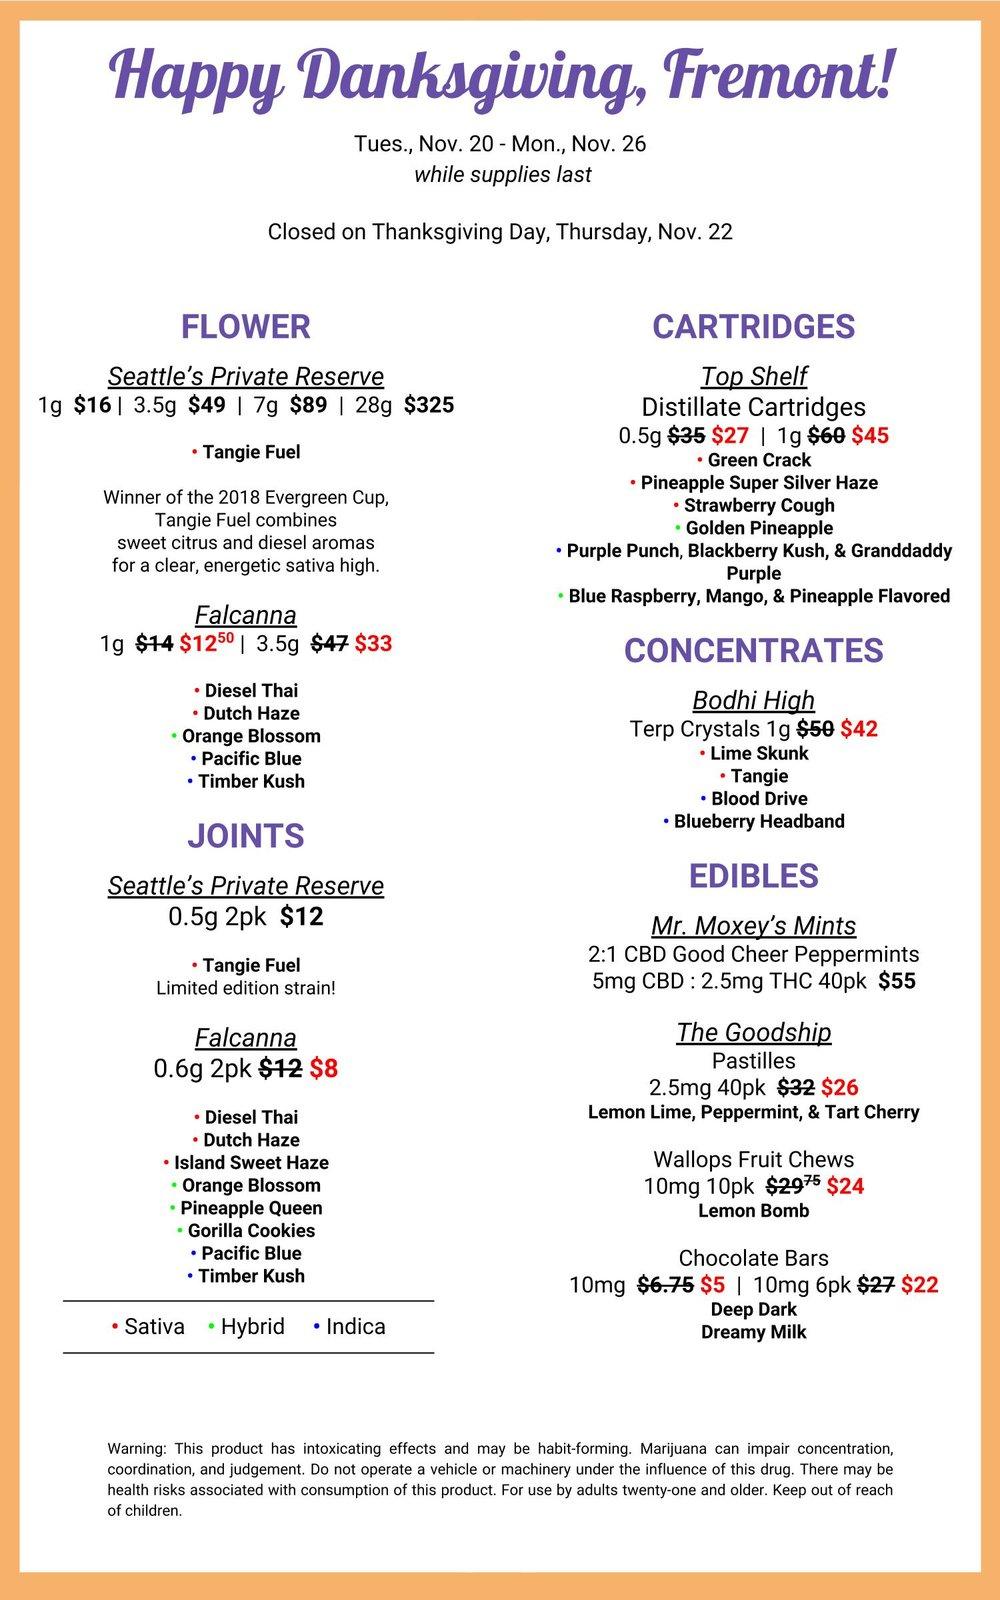 Fremont Happy Danksgiving sale menu for 11.20.2018.jpg